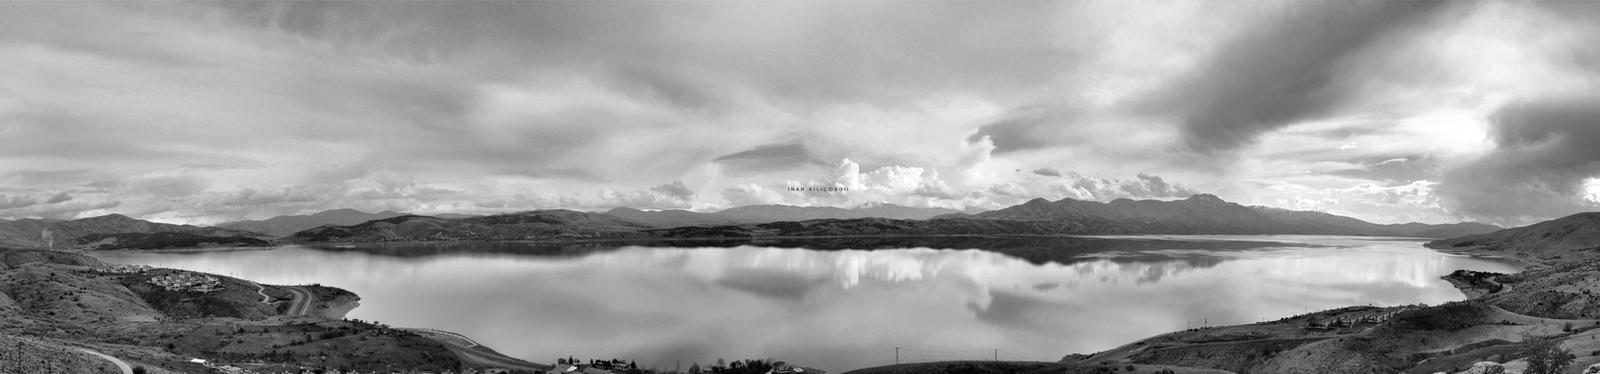 Lake by inankilic